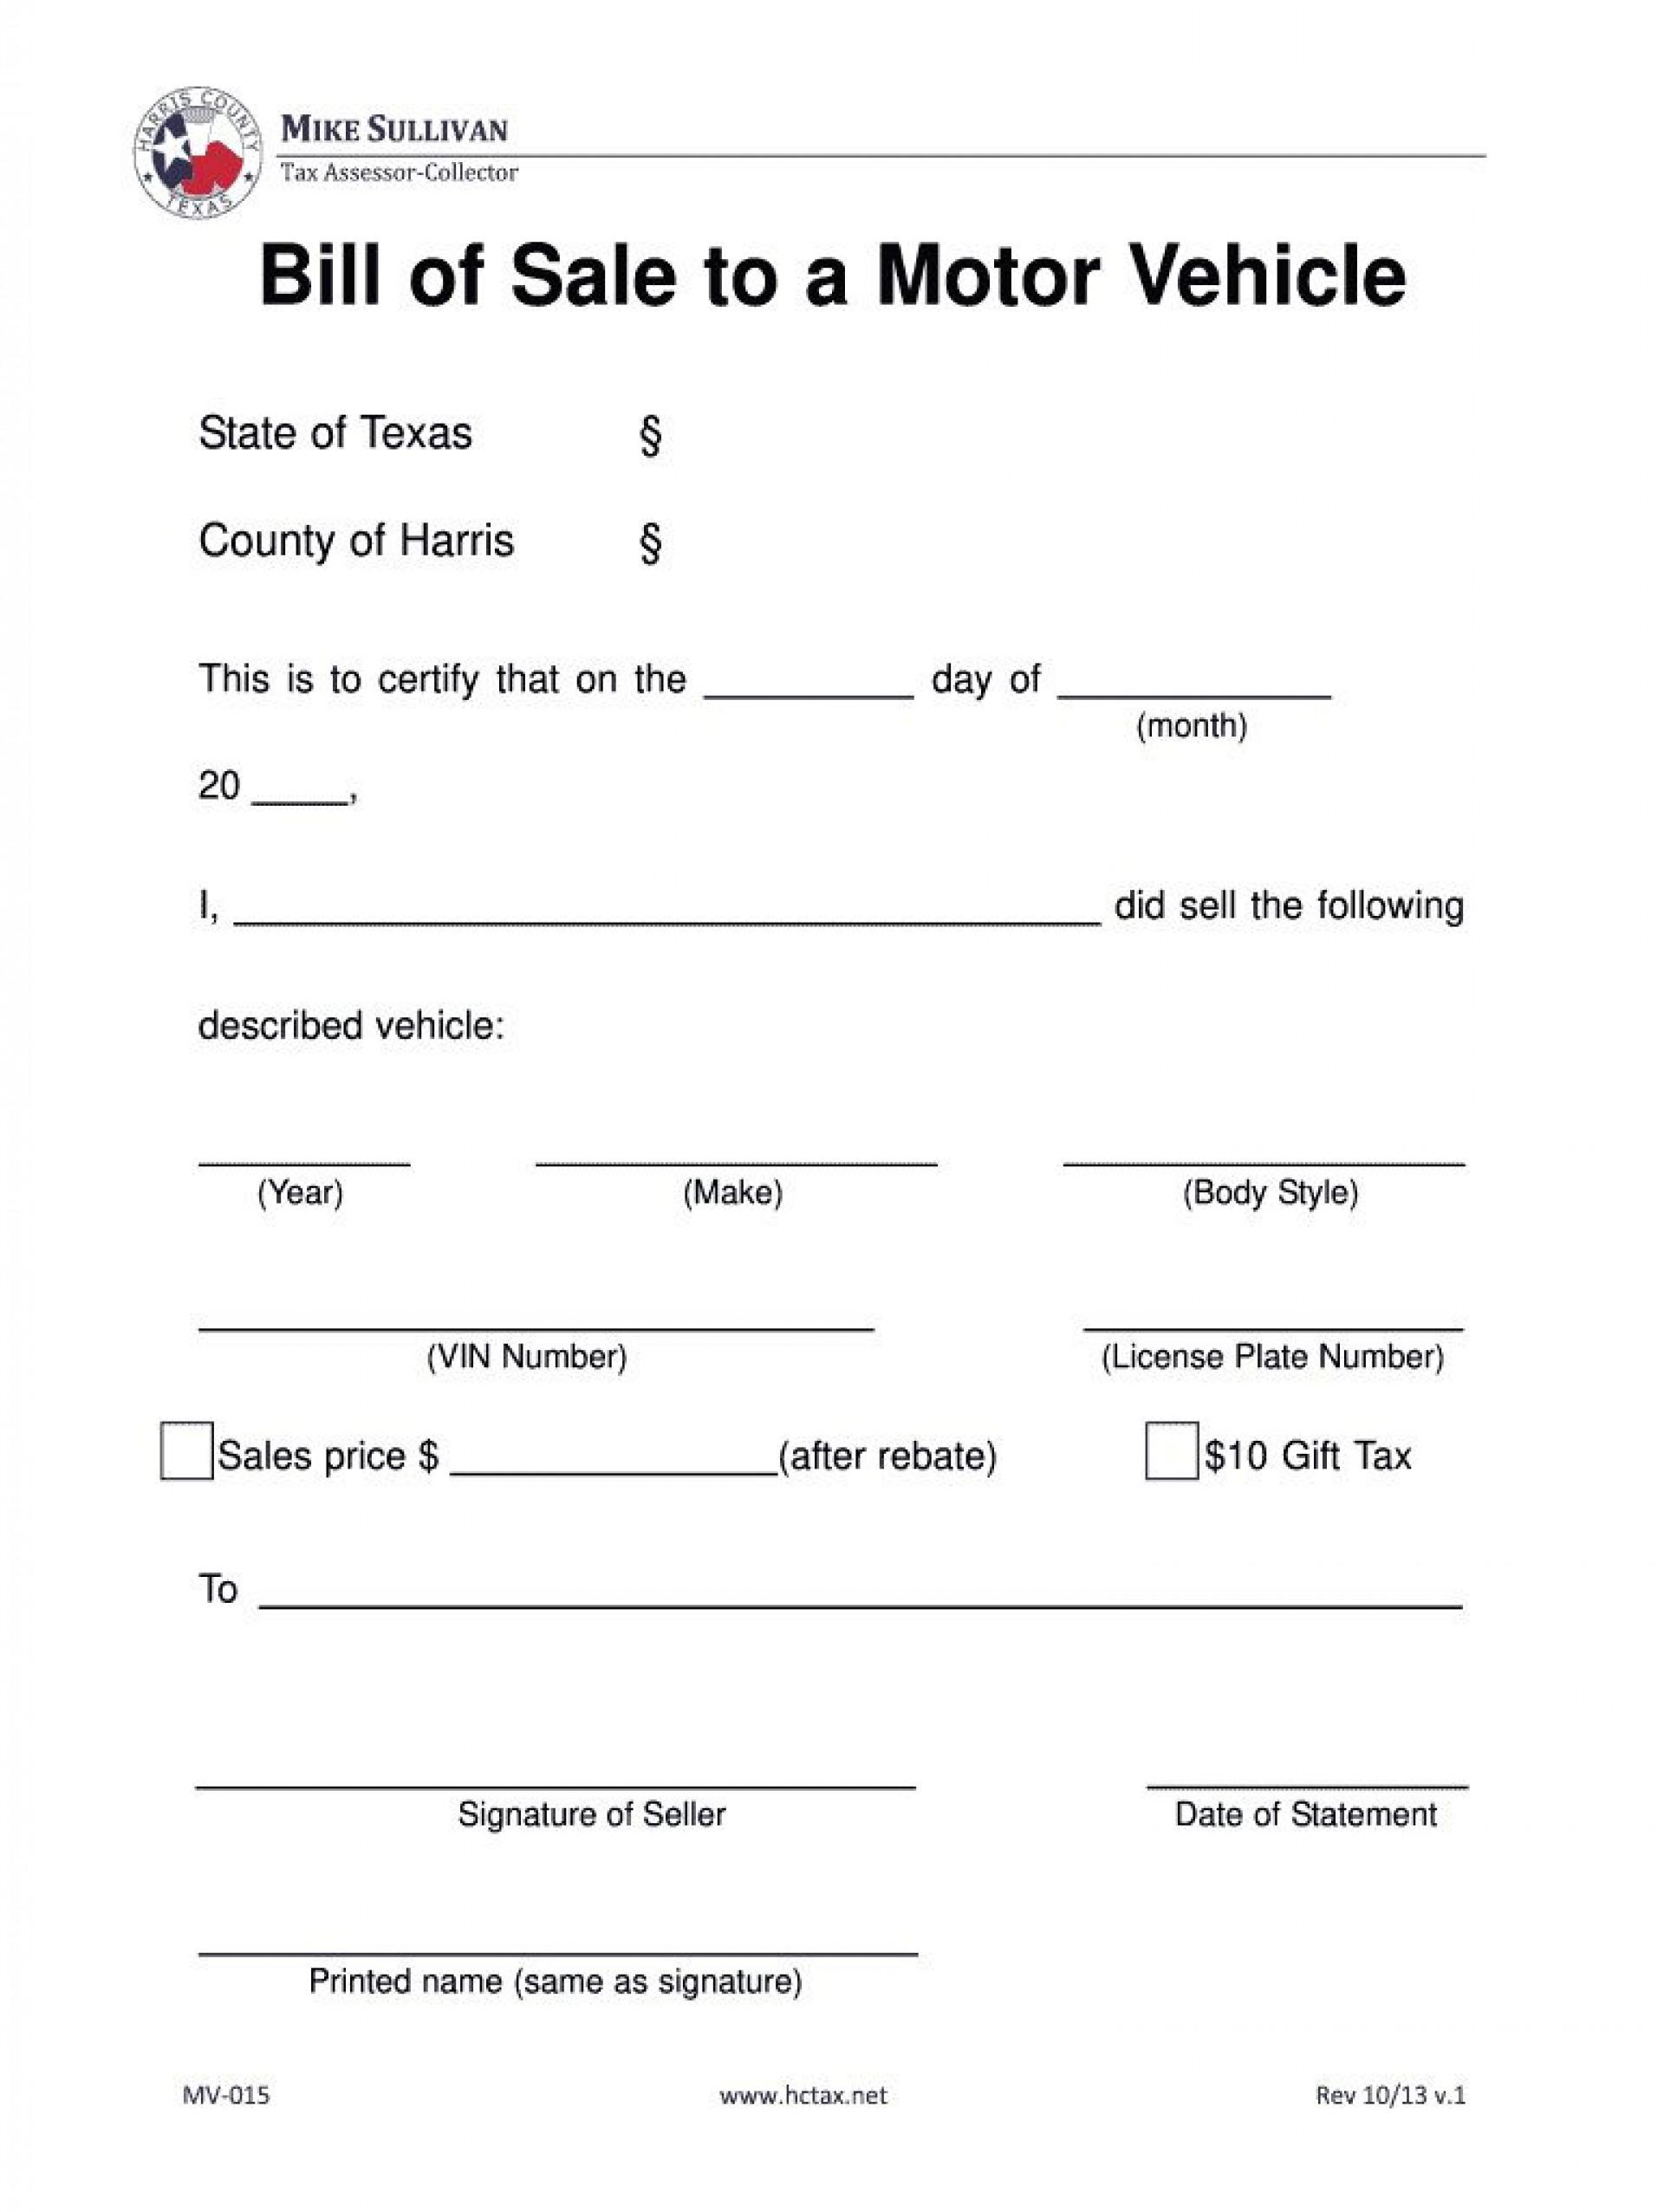 004 Archaicawful Bill Of Sale Template Texa Sample  Texas Free Car Form Dmv Document1920